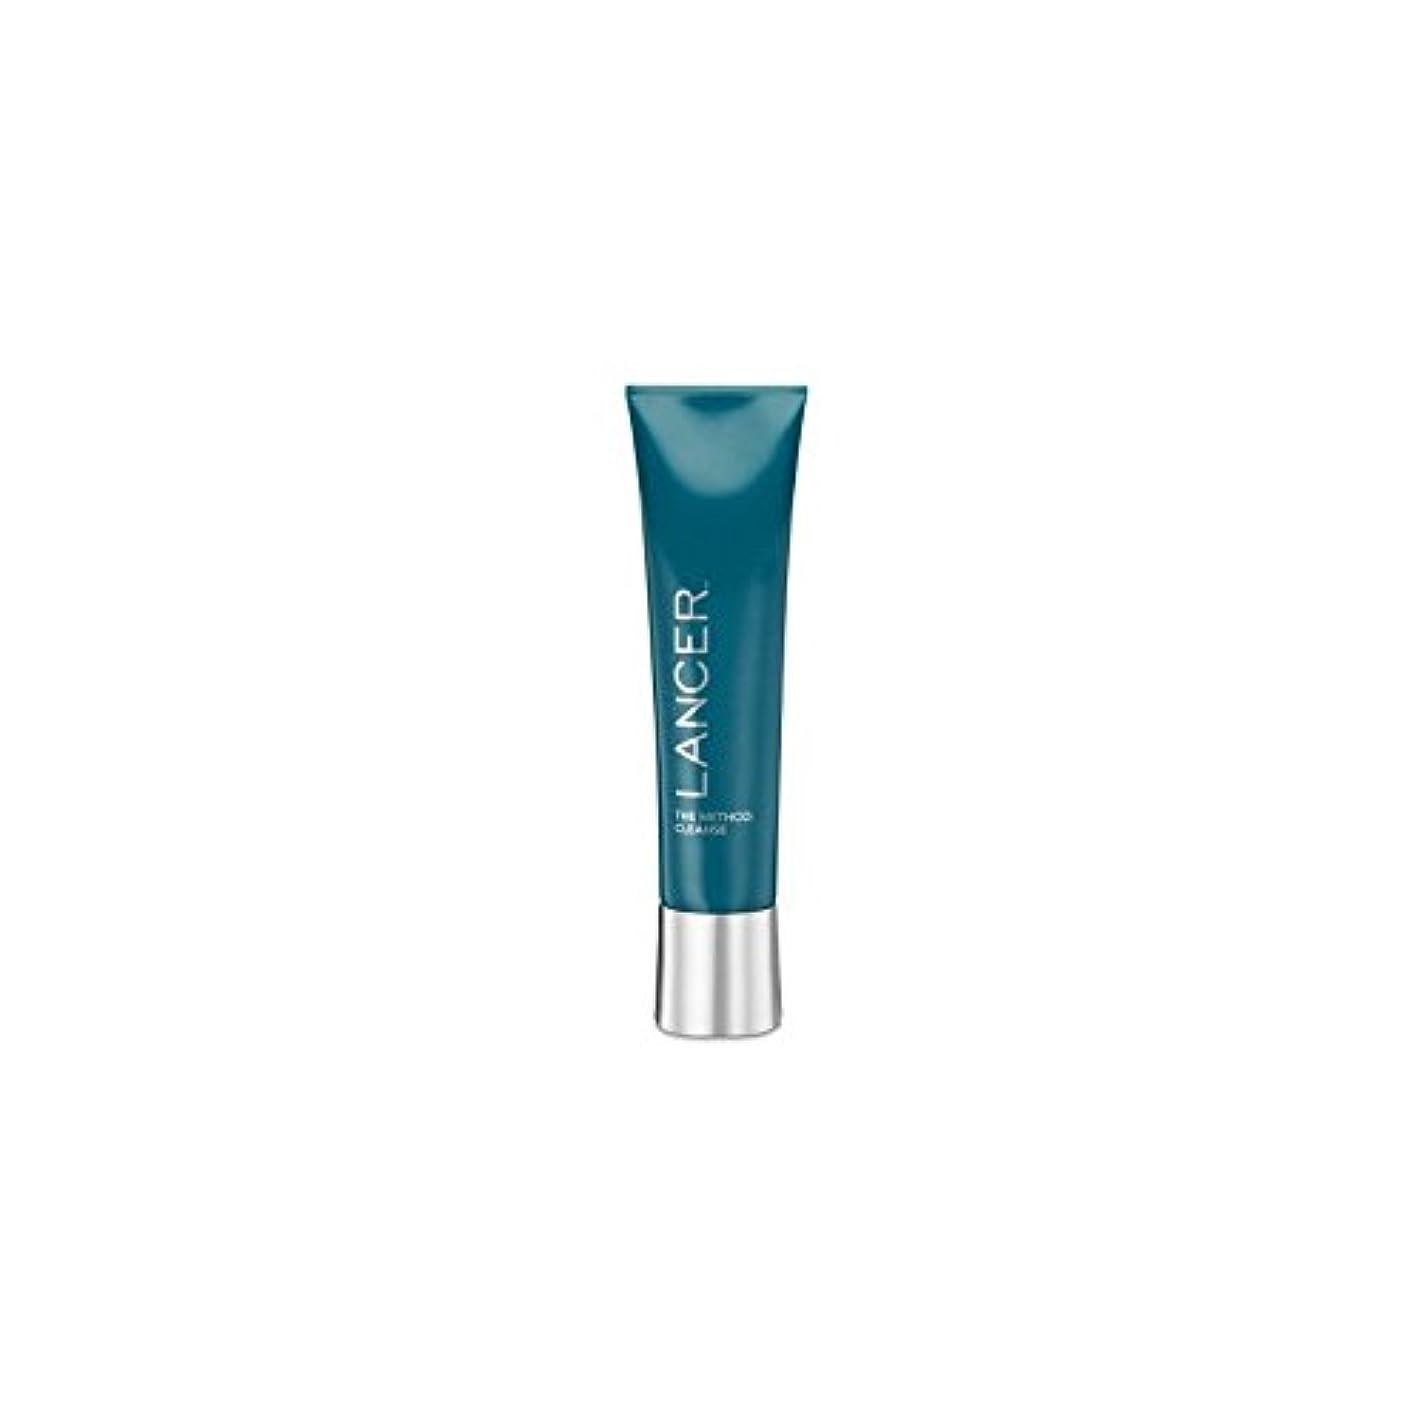 Lancer Skincare The Method: Cleanser (120ml) - クレンザー(120ミリリットル):ランサーは、メソッドをスキンケア [並行輸入品]